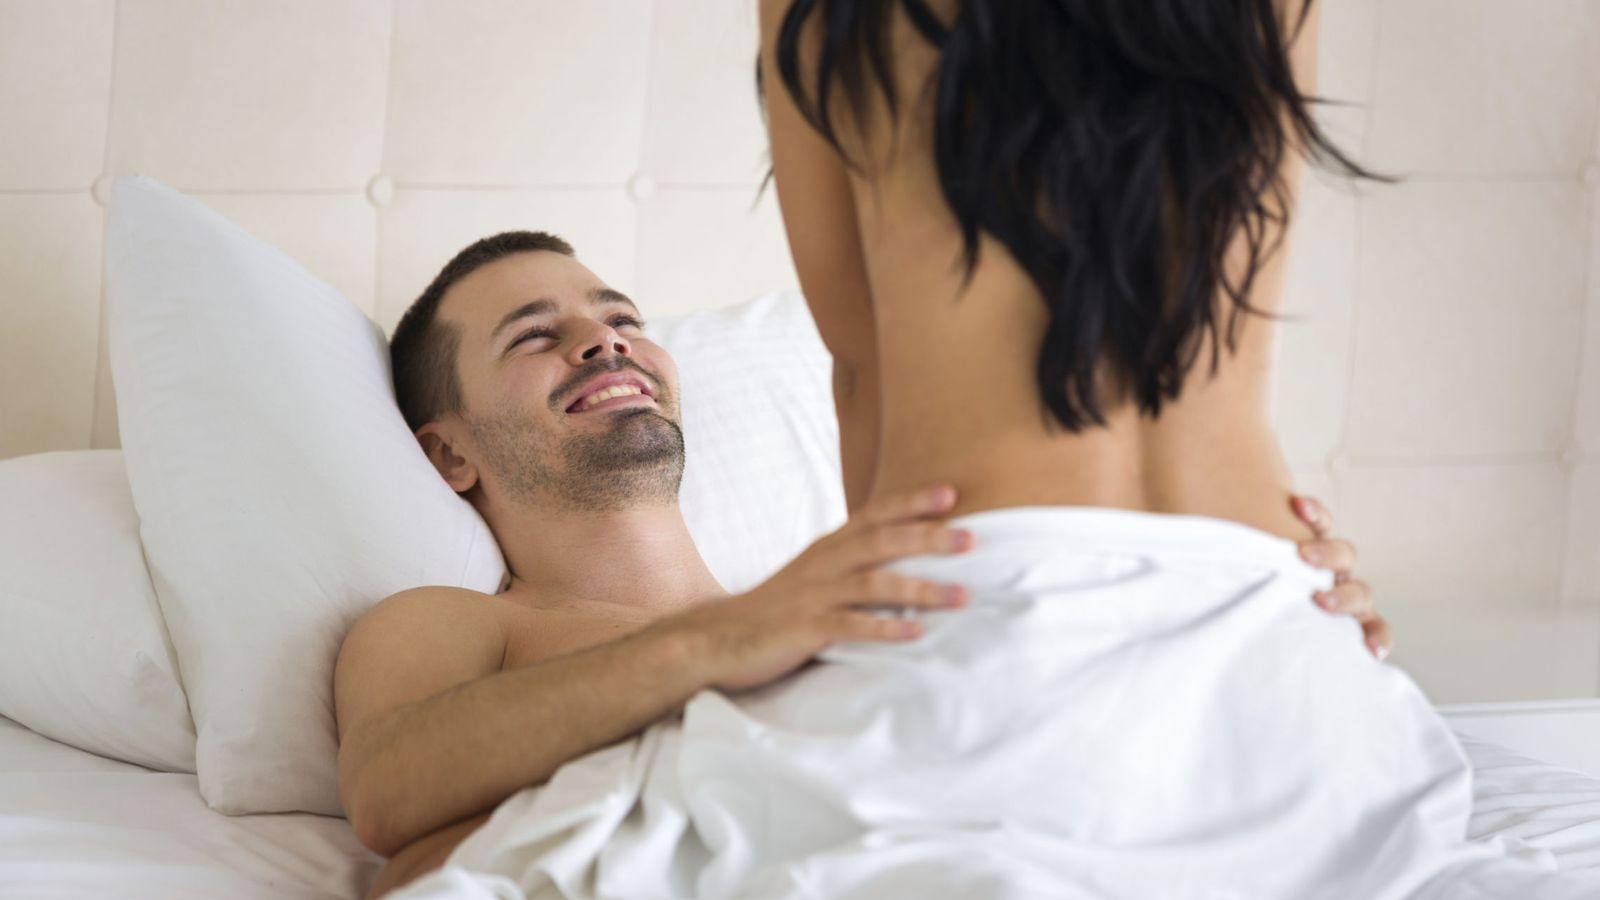 Busco mujer soltera facebook sexo registraduria